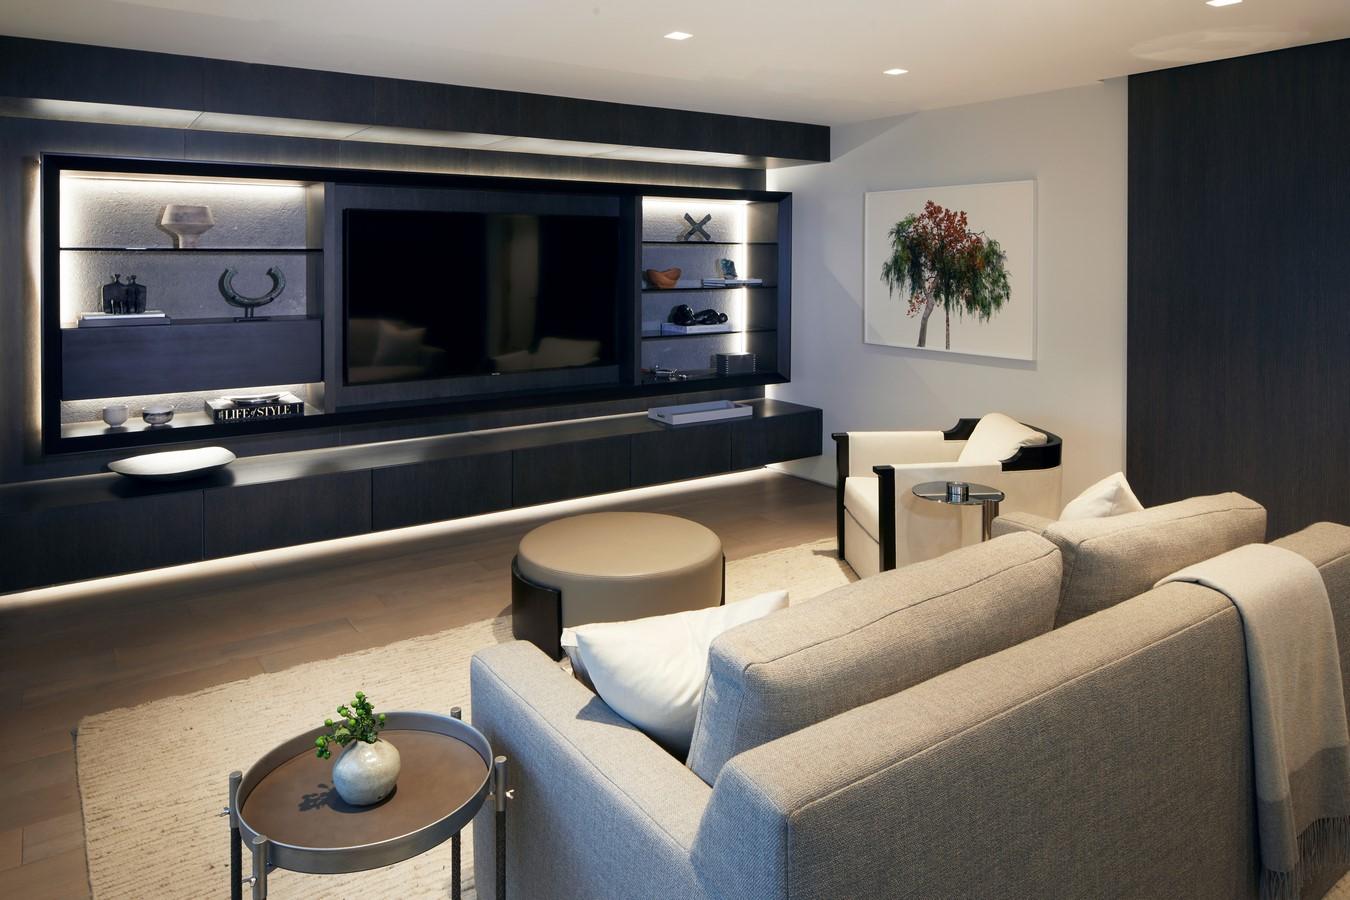 5164 Ocean Avenue, Santa Monica by Abramson Architects: Sheet 3